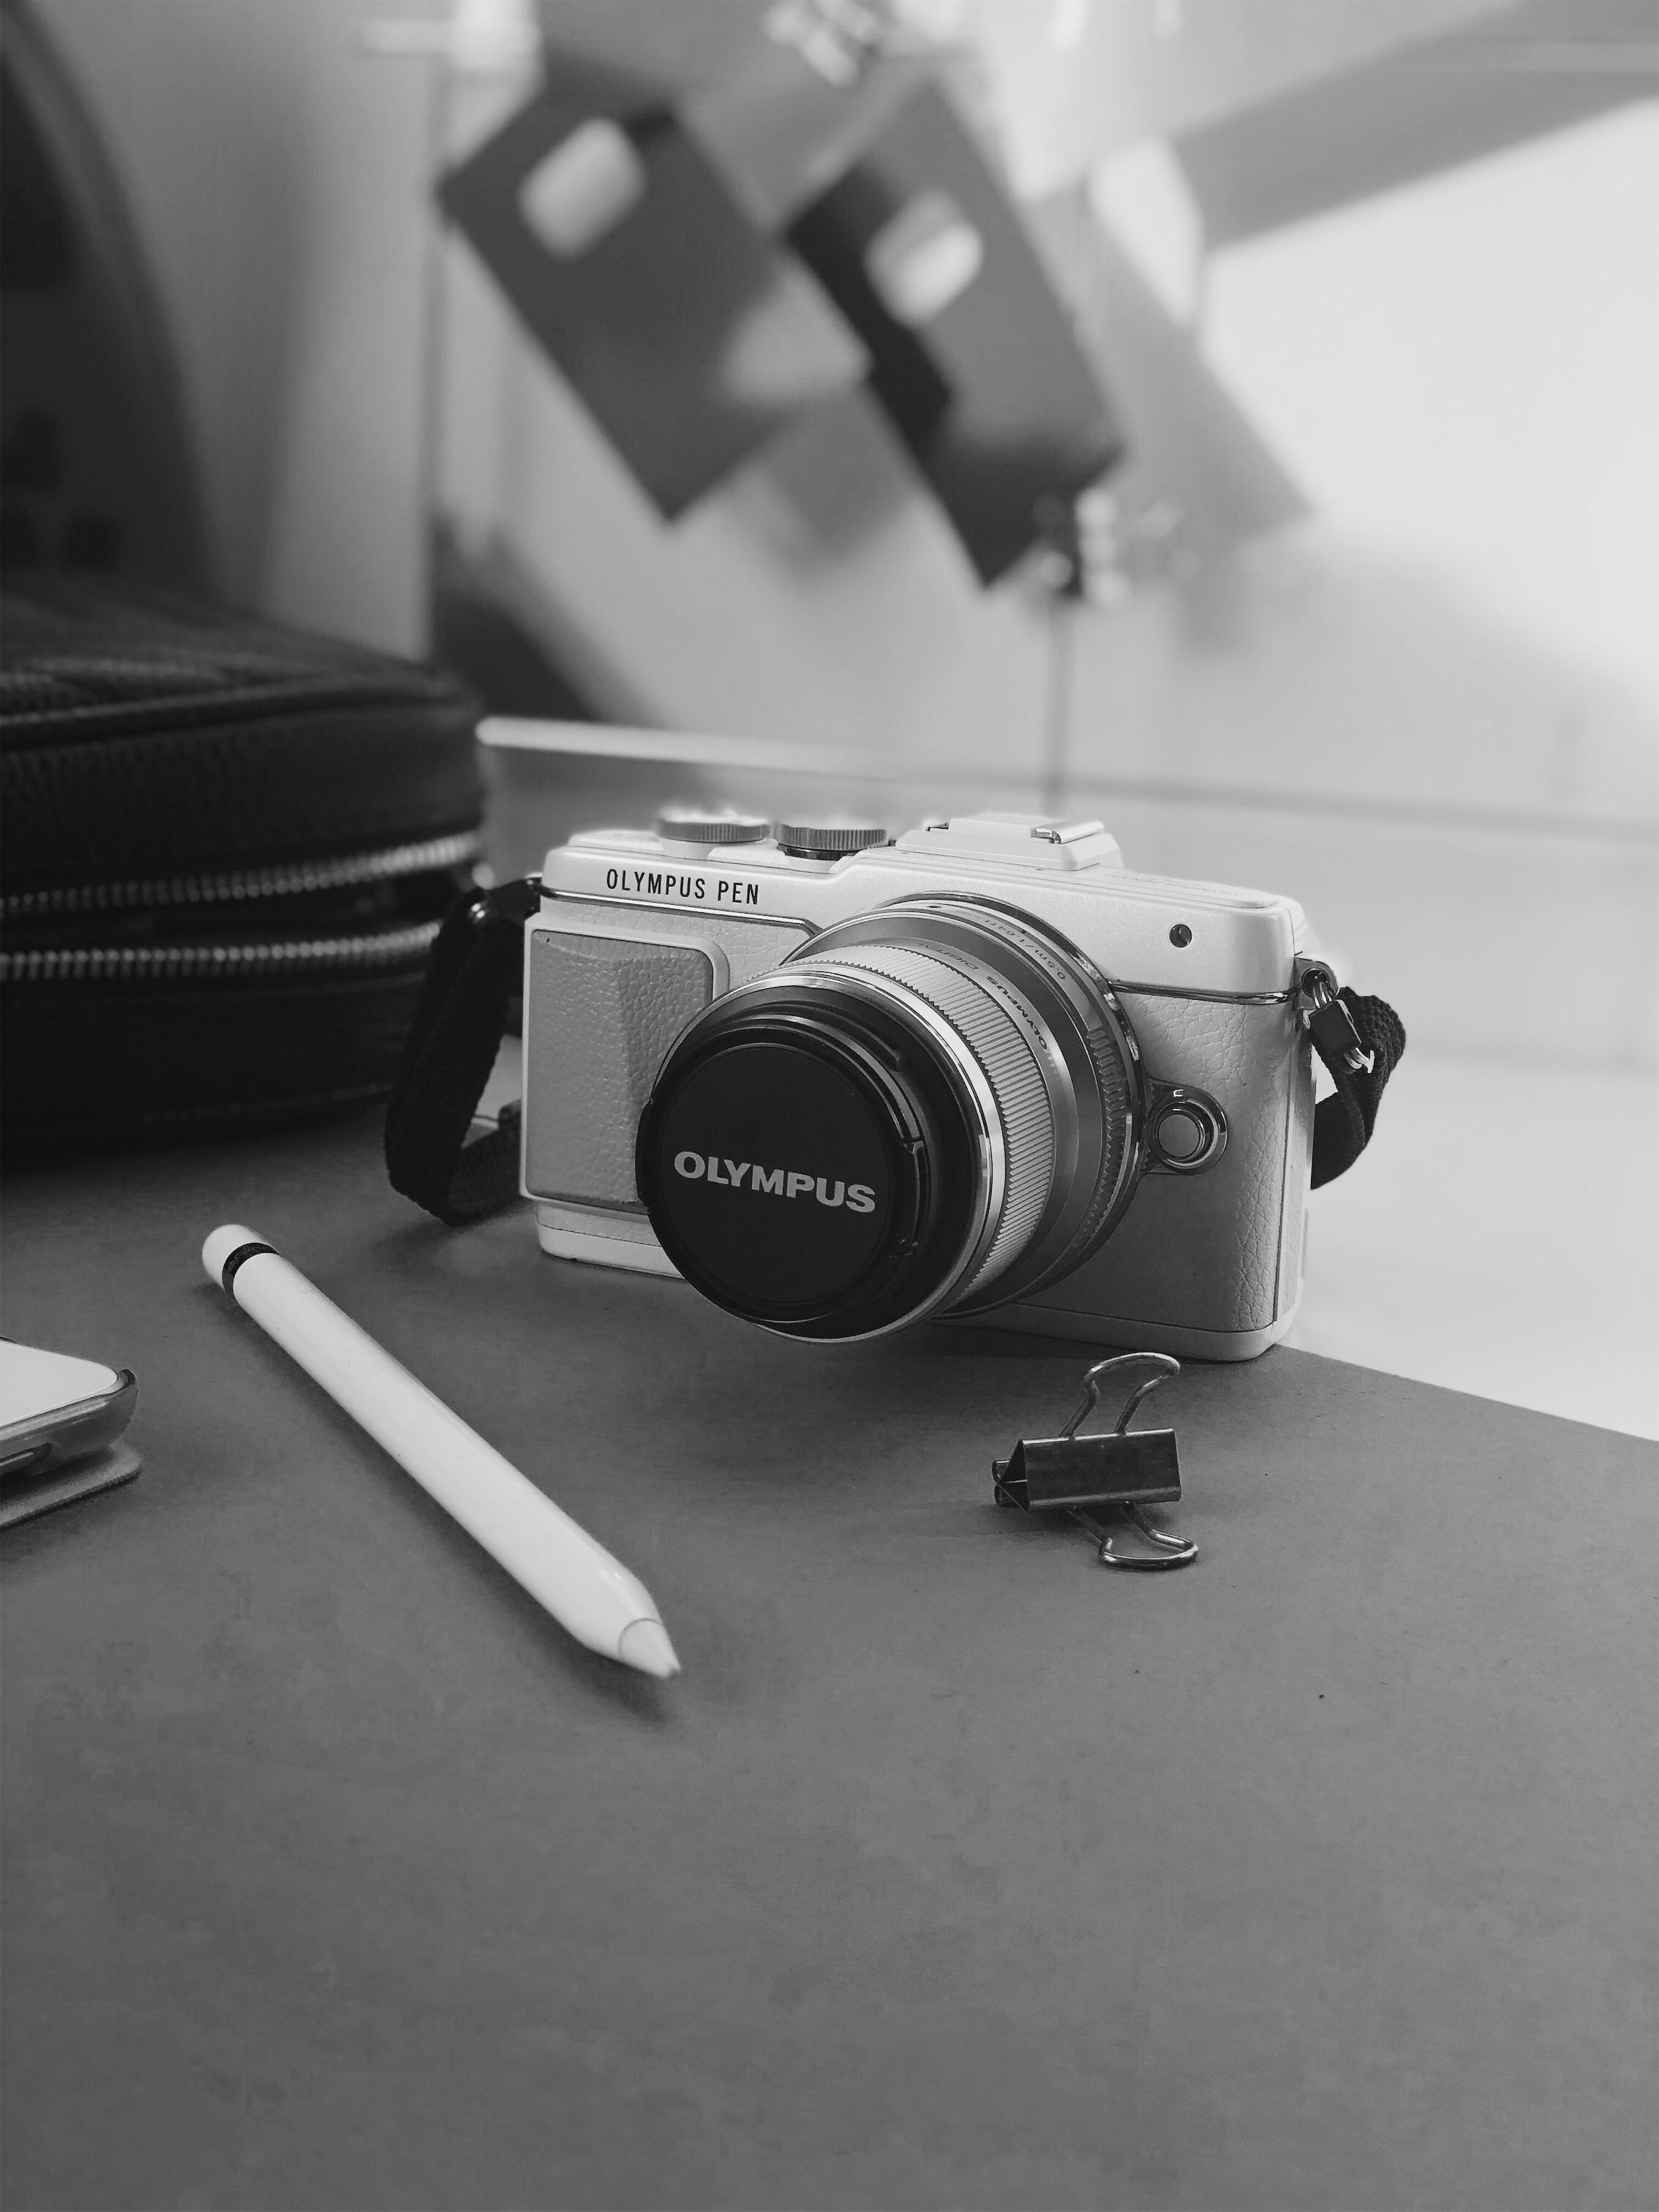 Olympus-pen-photography